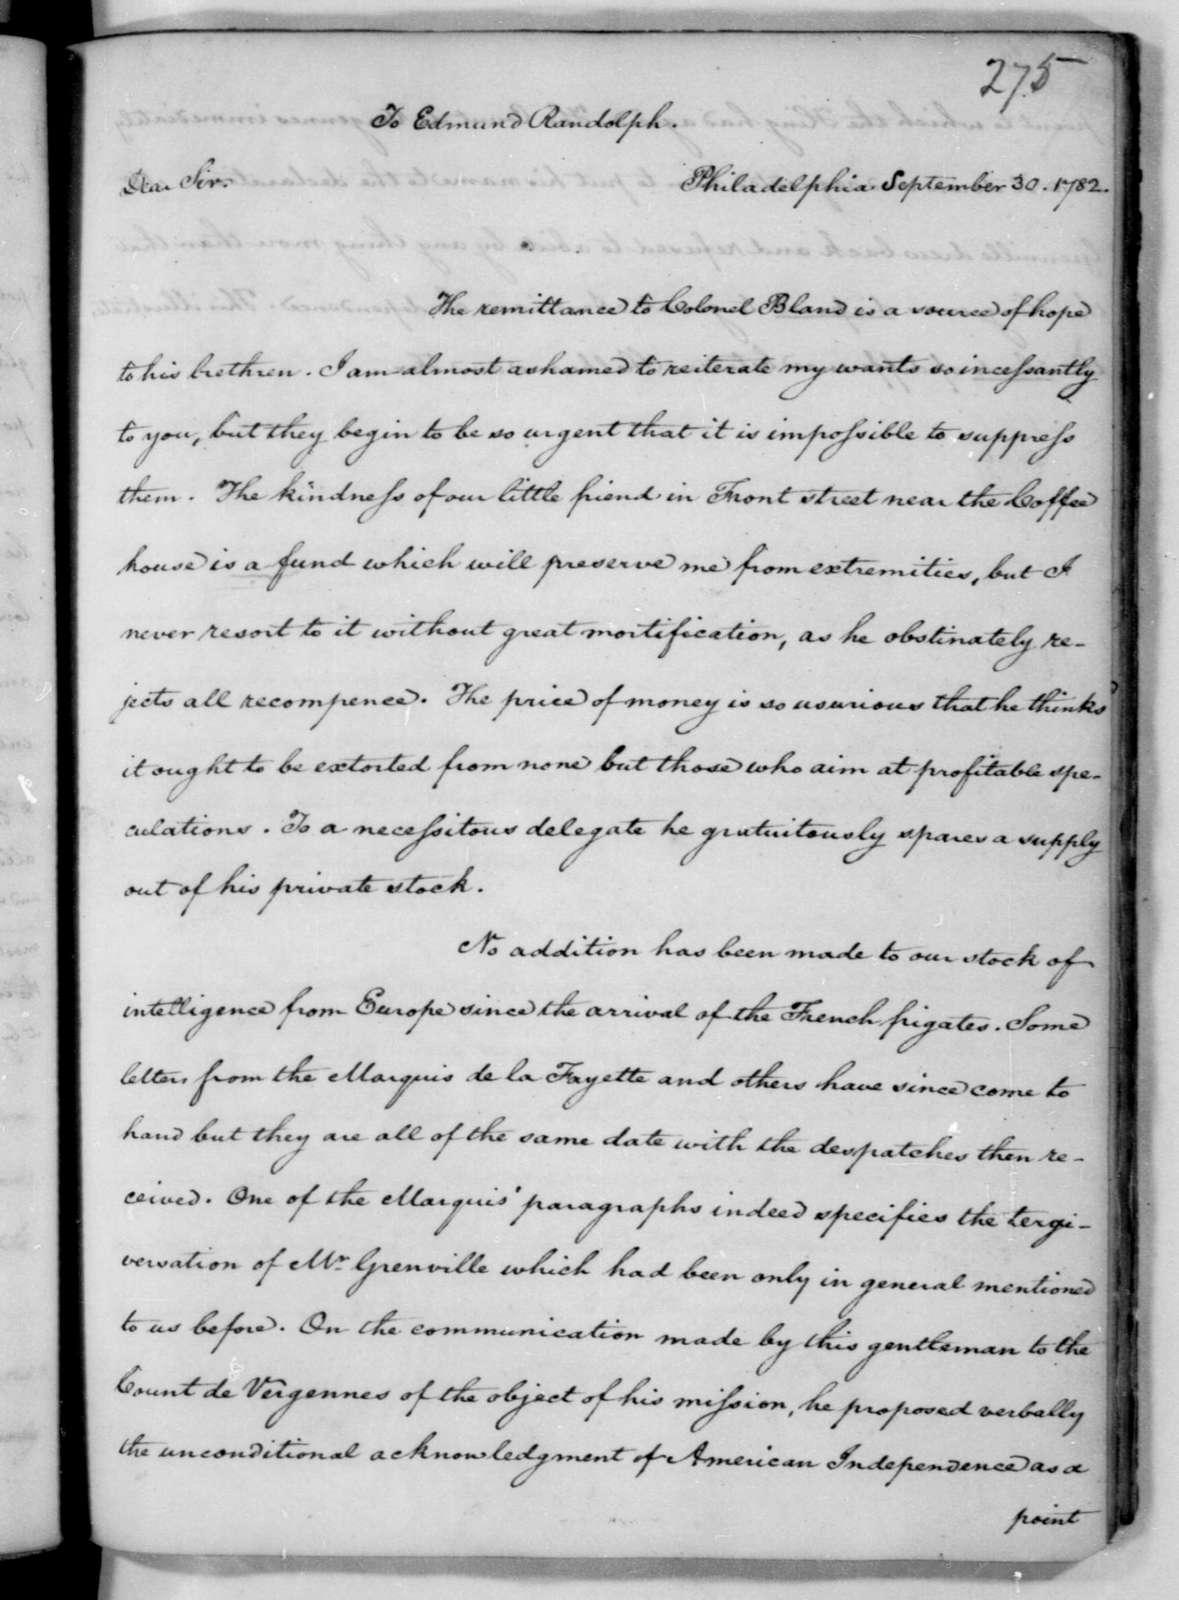 James Madison to Edmund Randolph, September 30, 1782.